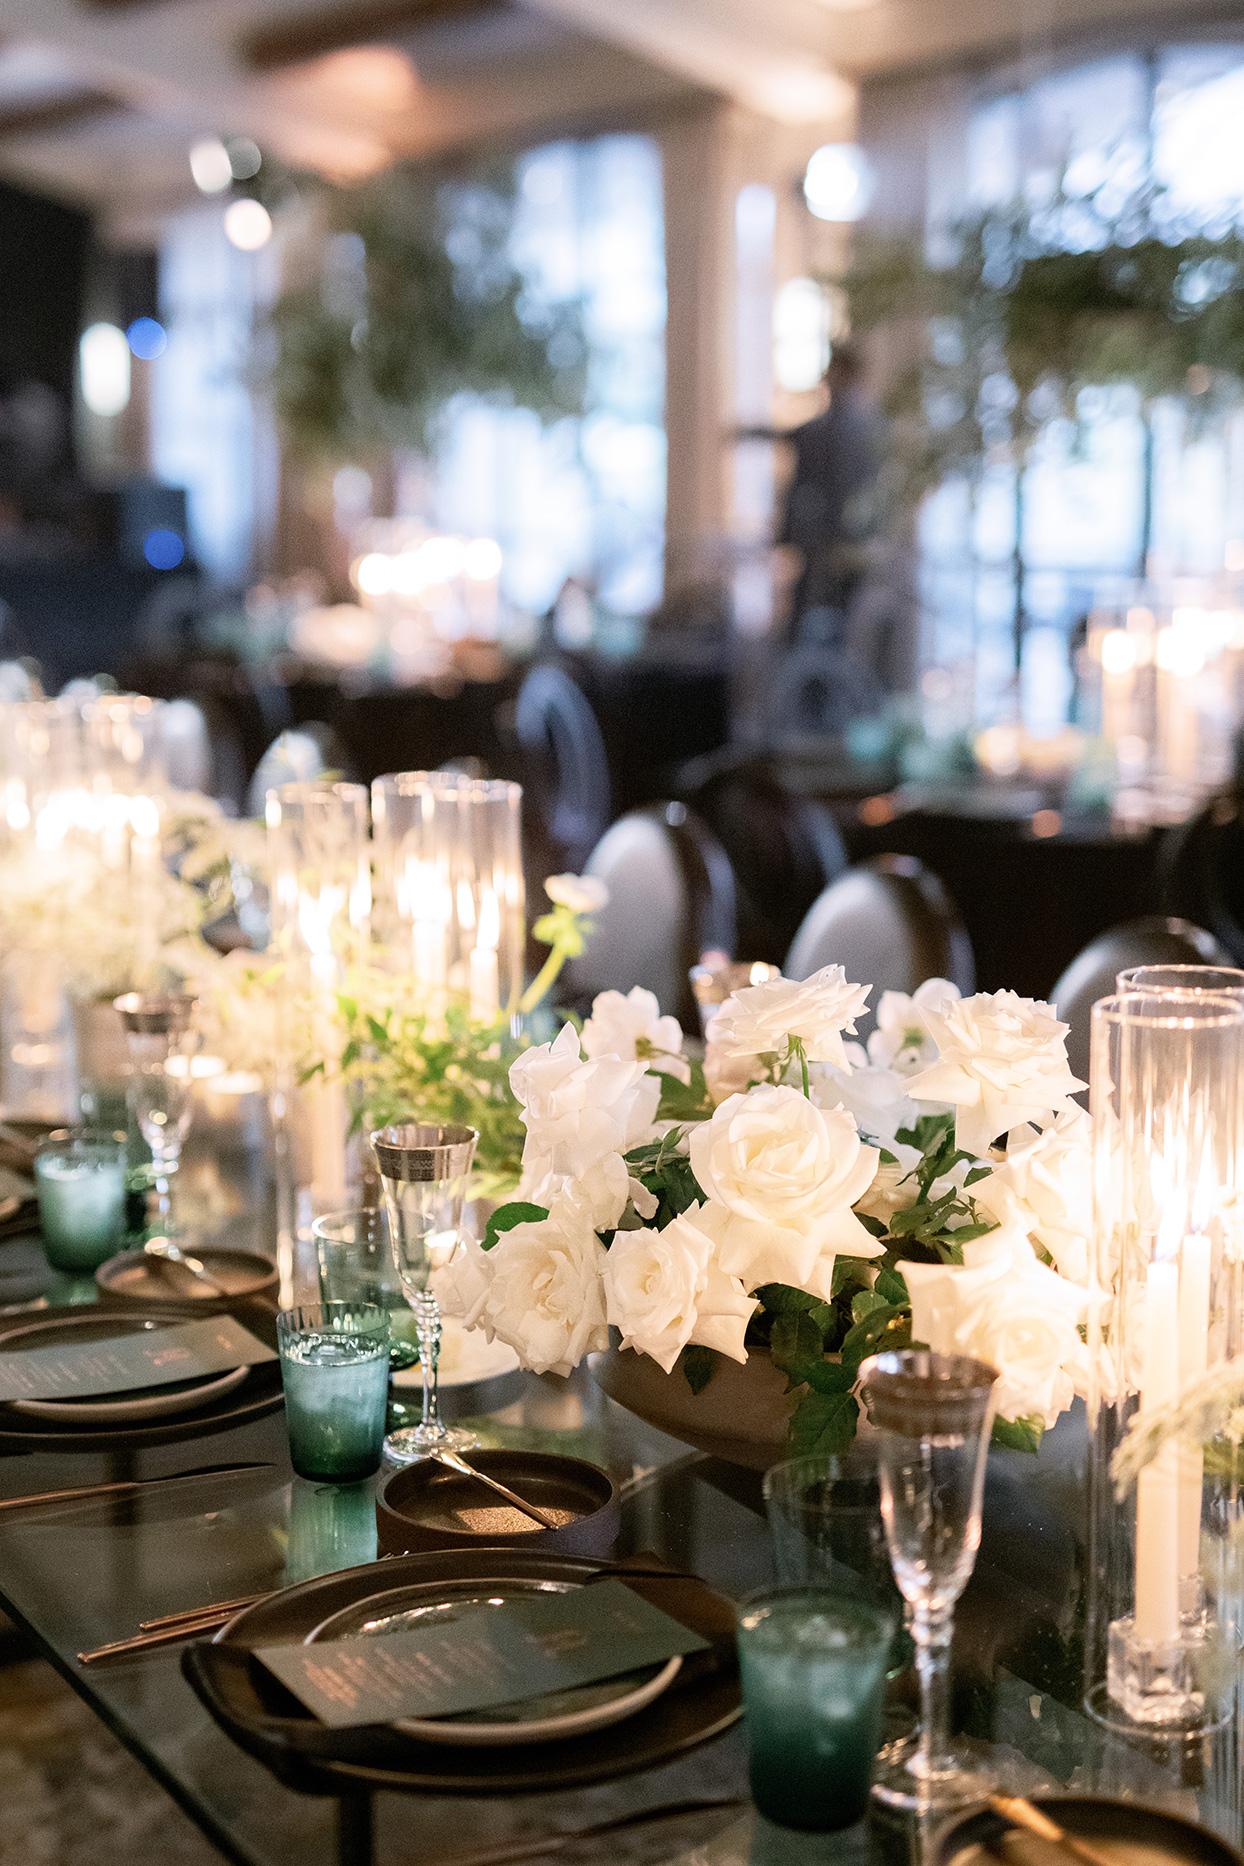 jason justin wedding reception white floral centerpieces